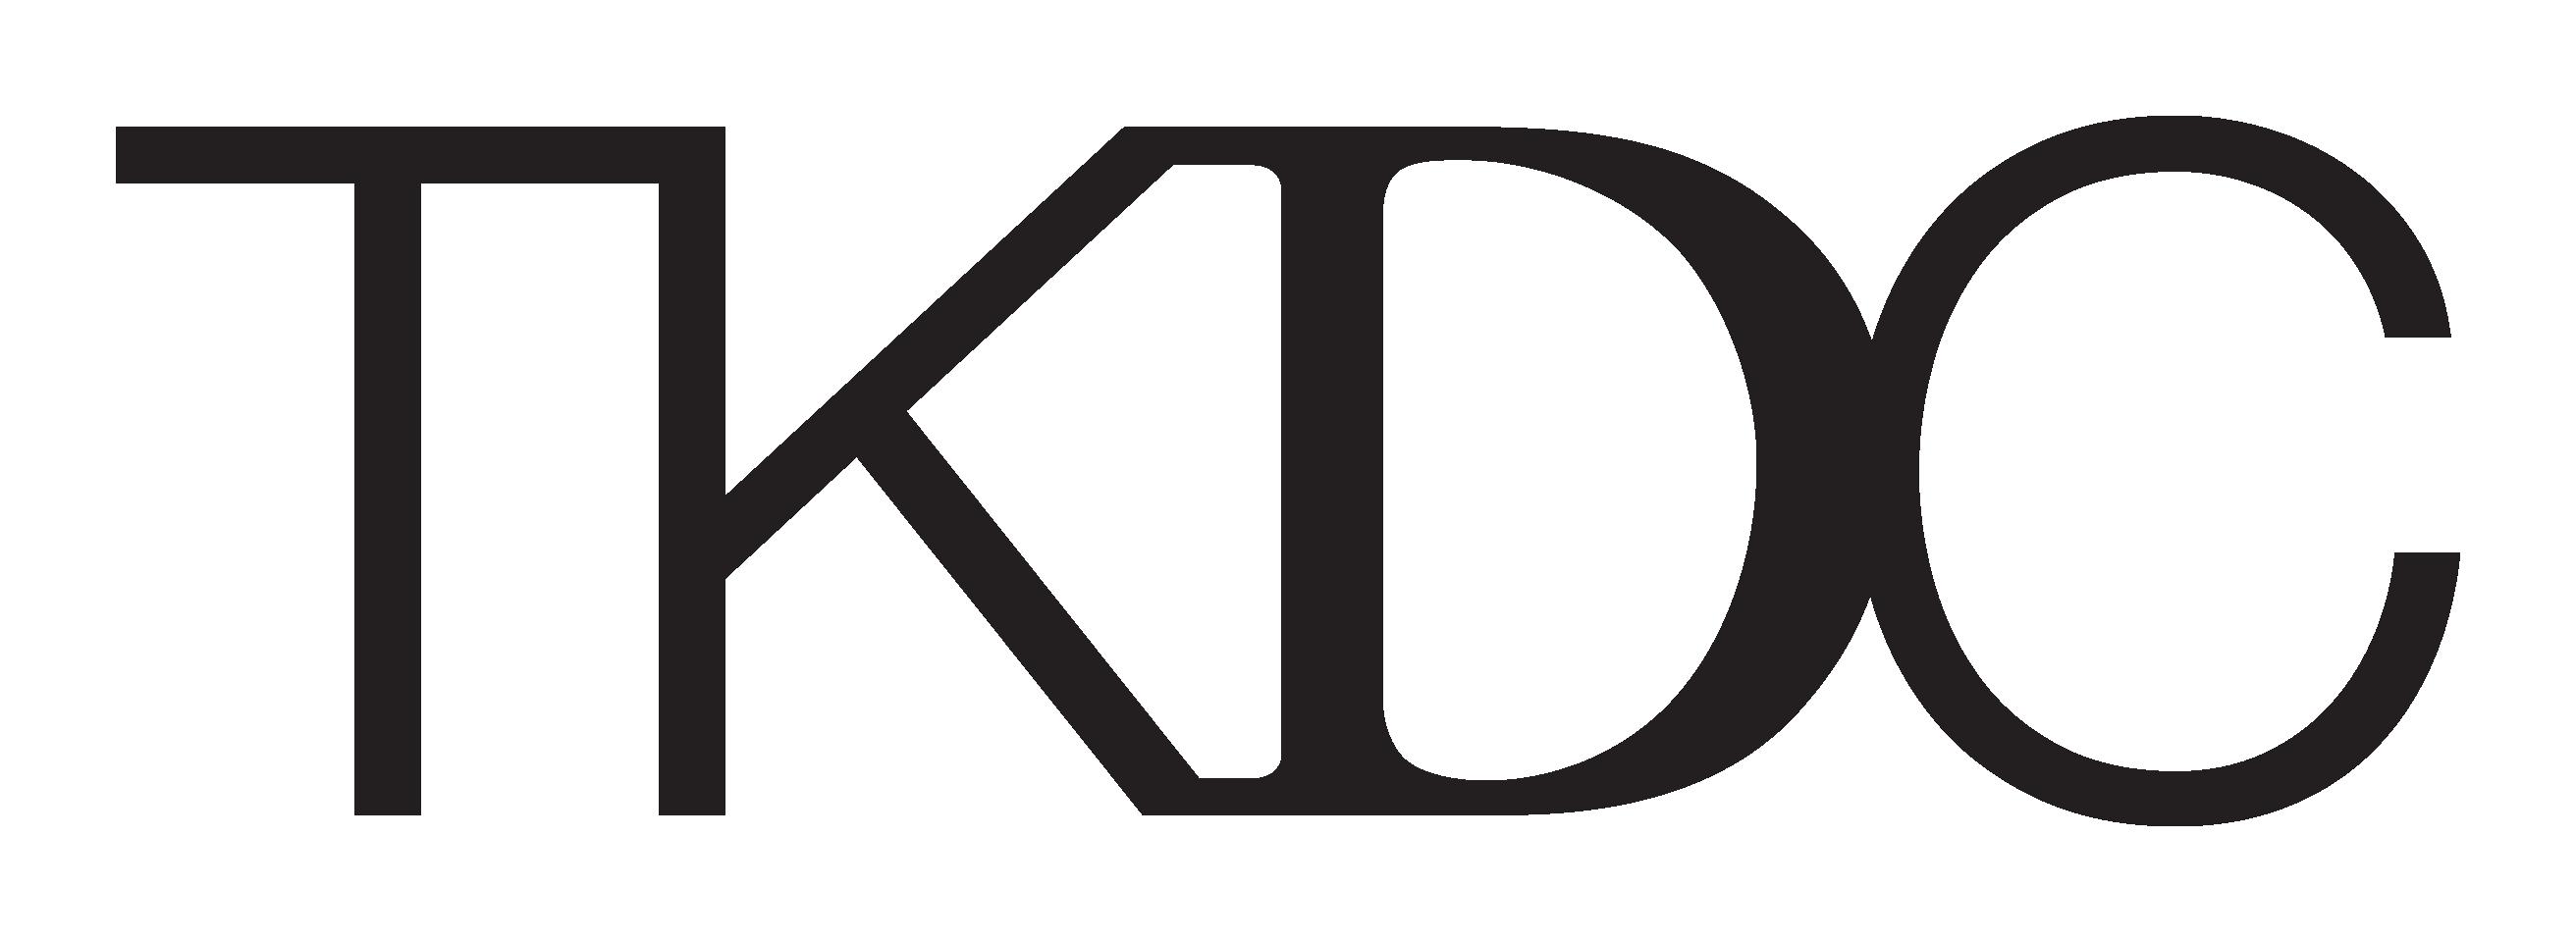 TKDC logo